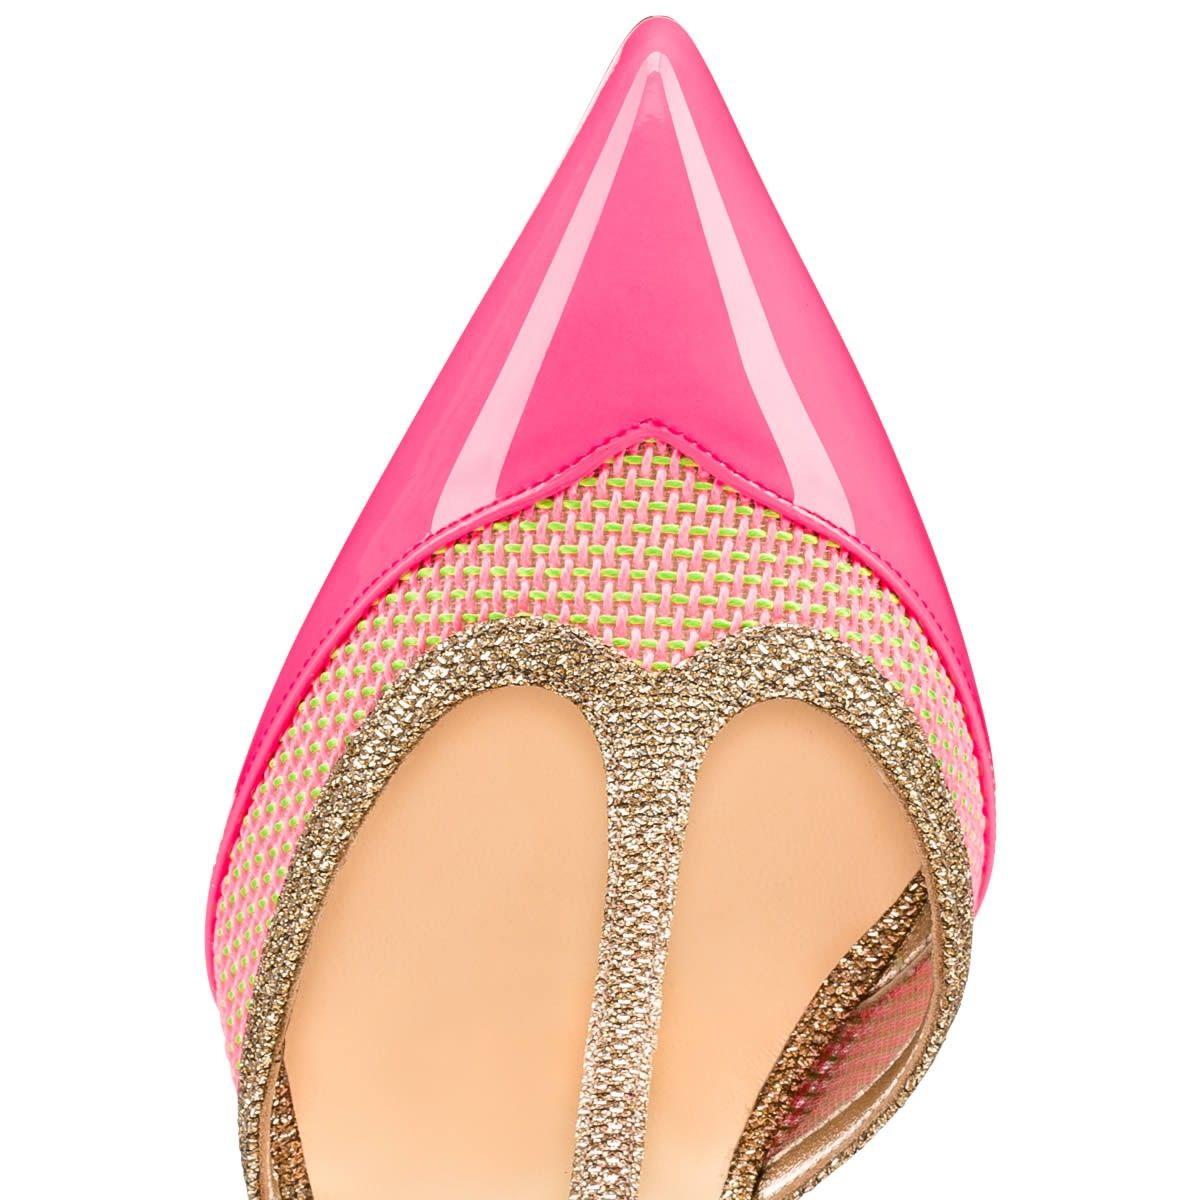 Chaussures femme - Mrs Earl Vernis/raphia Fluo - Christian Louboutin